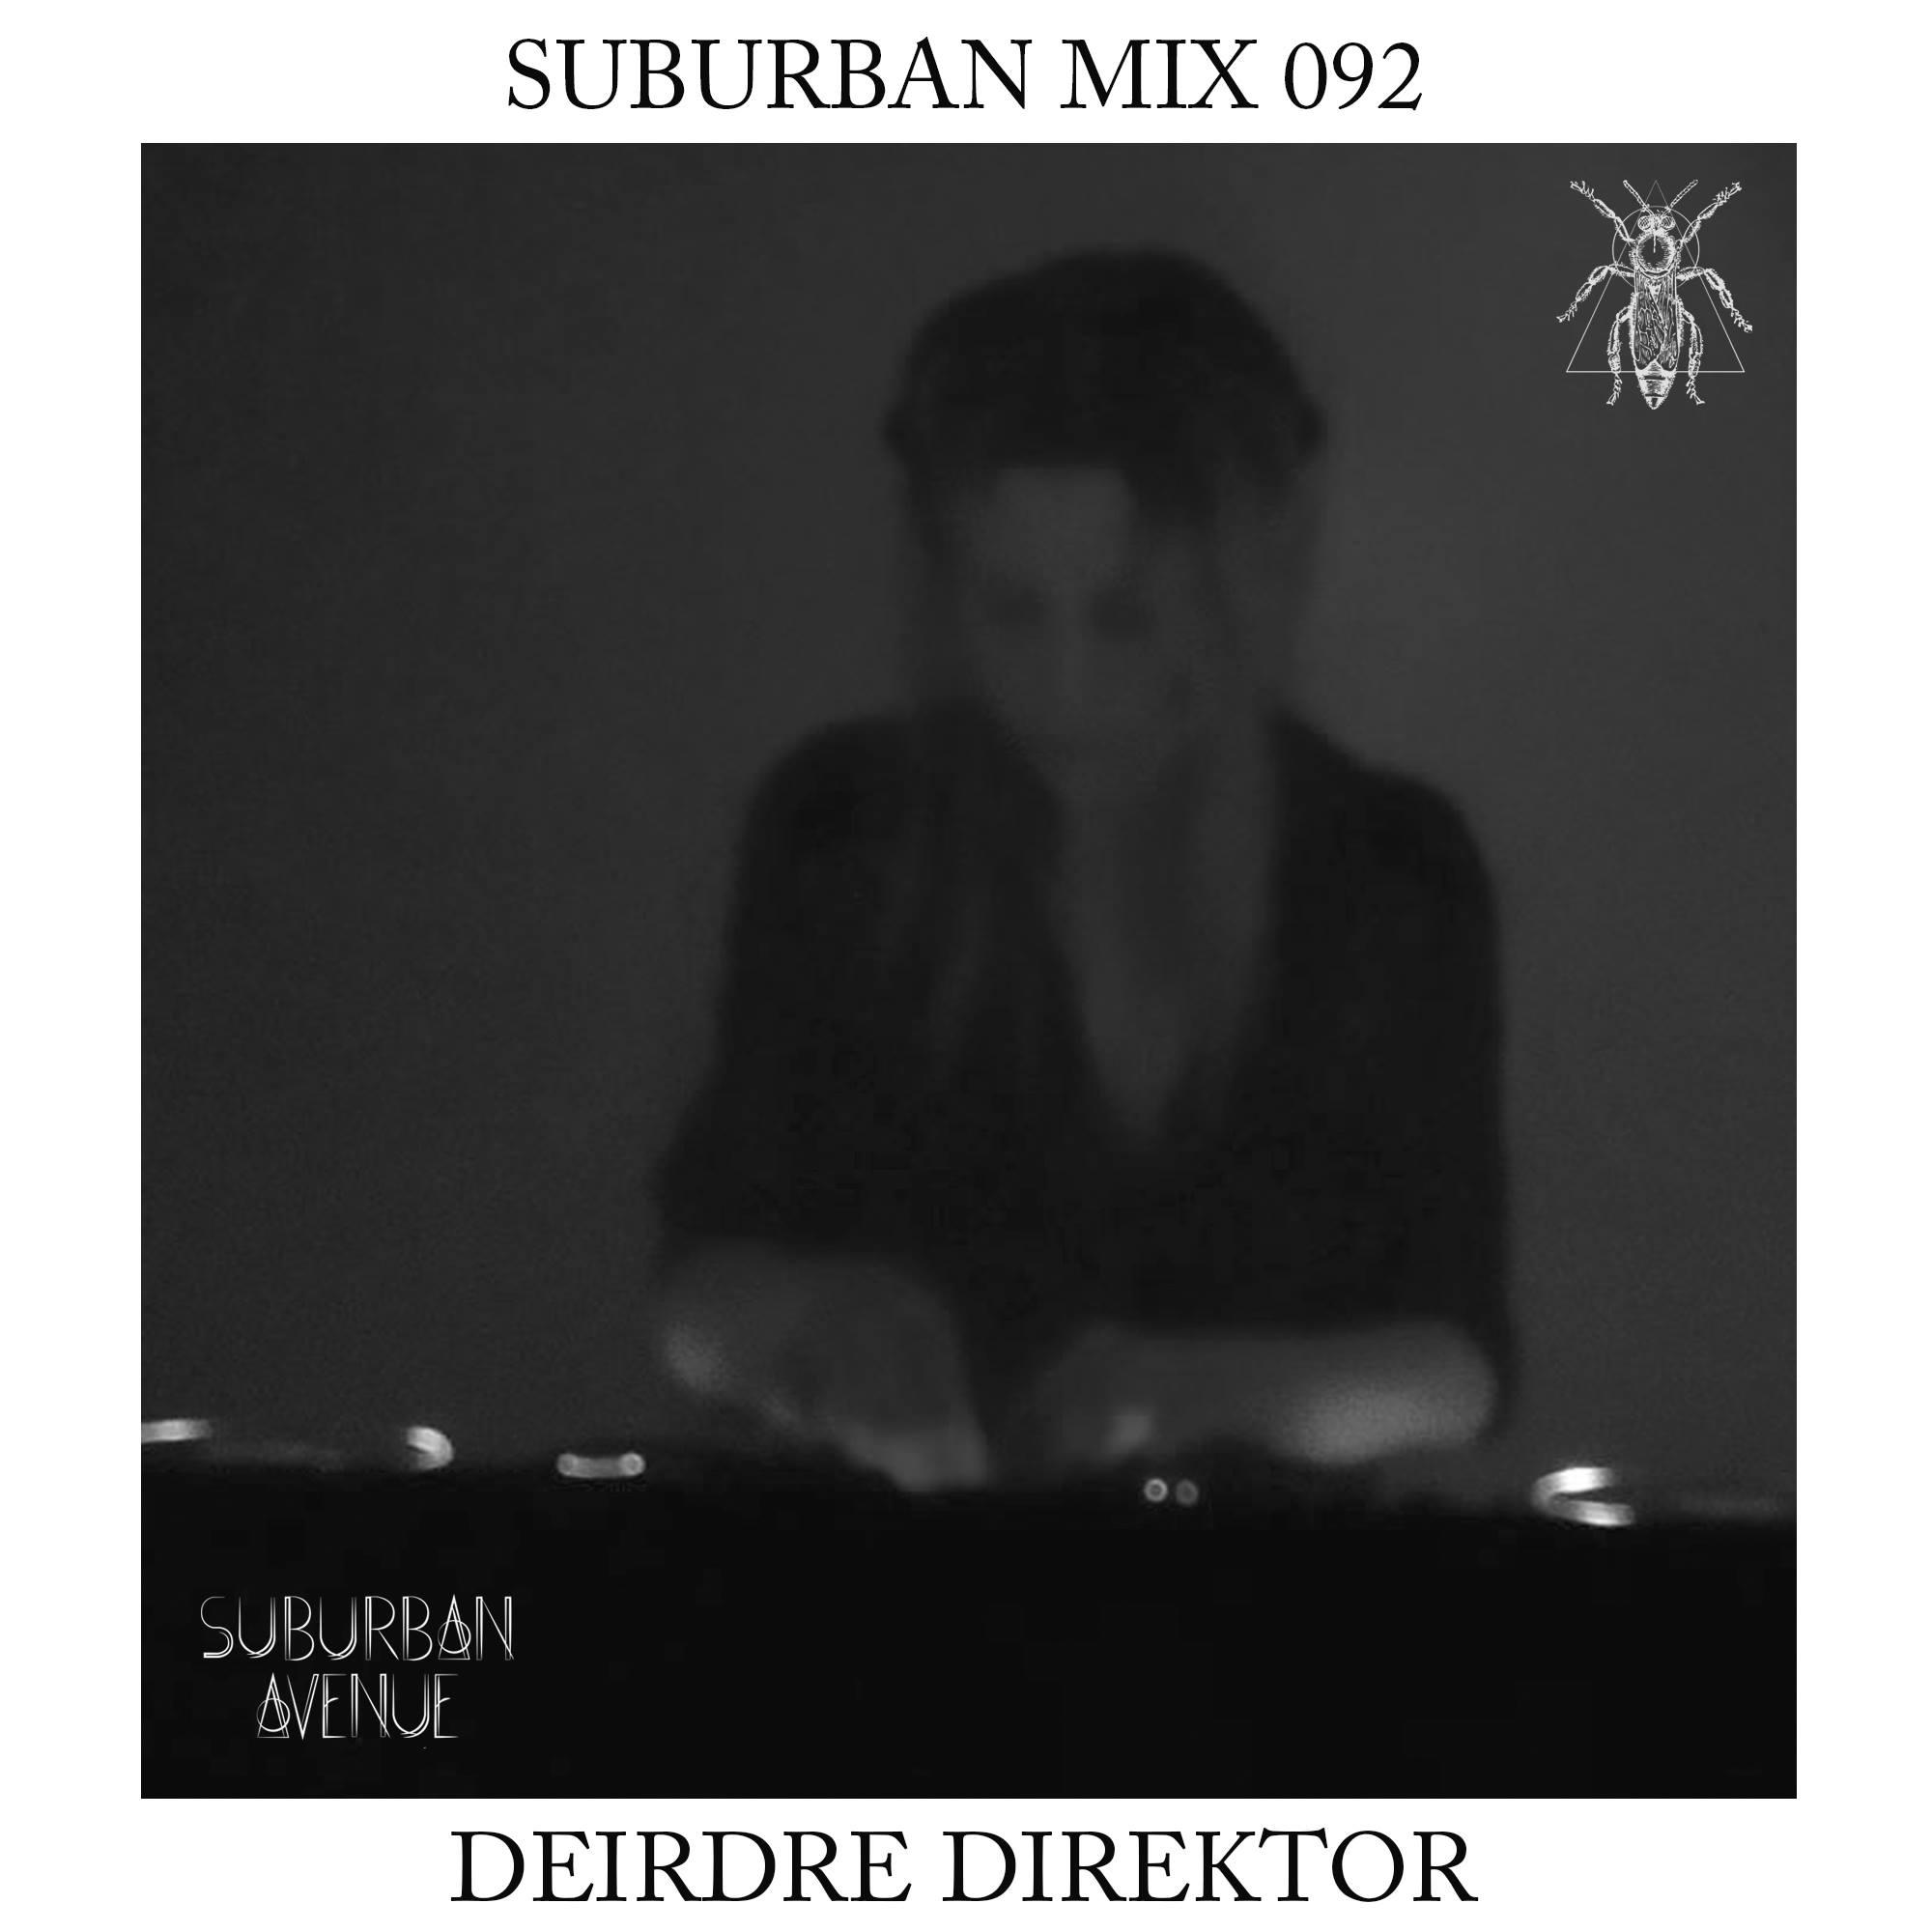 Suburban Mix 092 - Deirdre Direktor